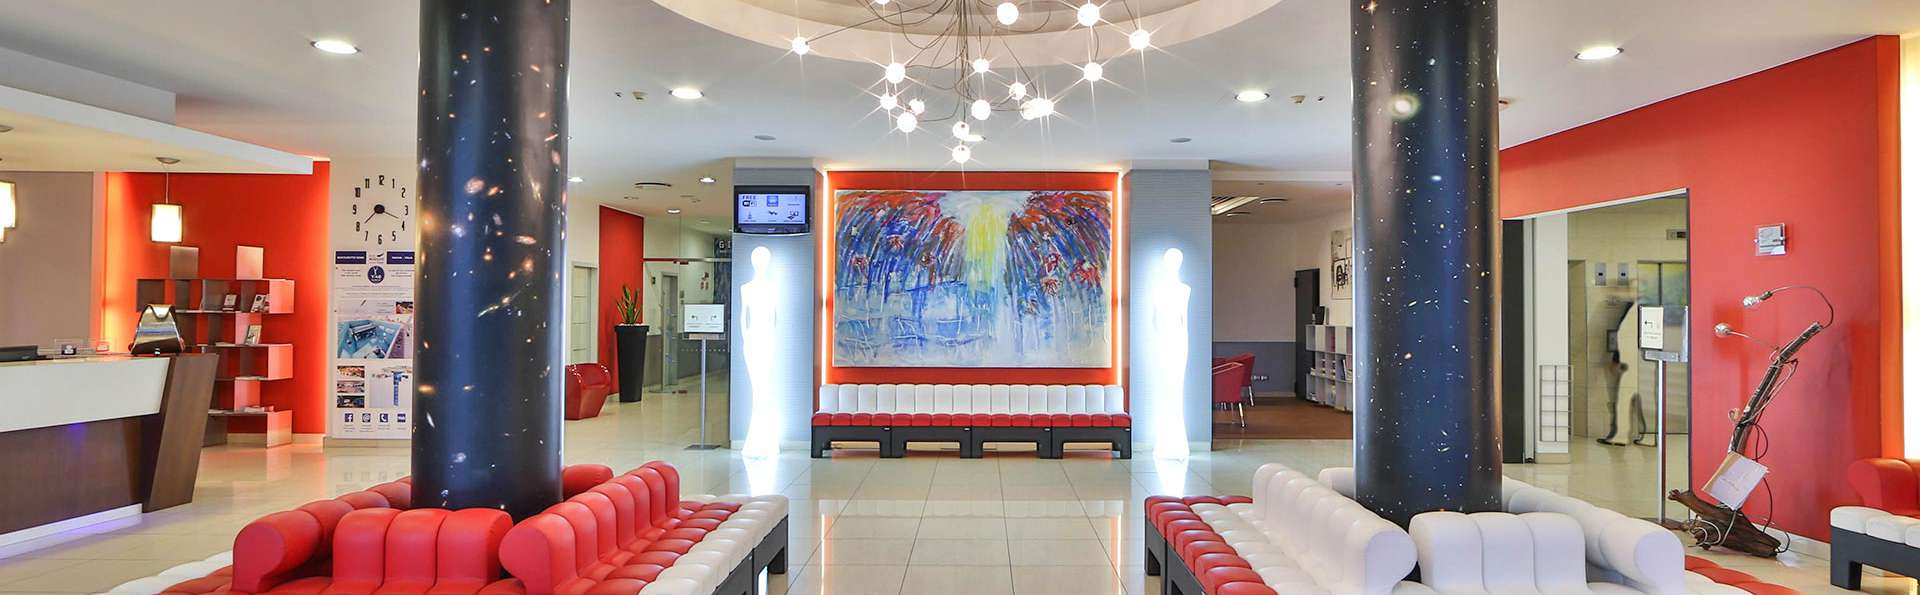 Best Western Plus Hotel Galileo Padova - EDIT_LOBBY_01.jpg